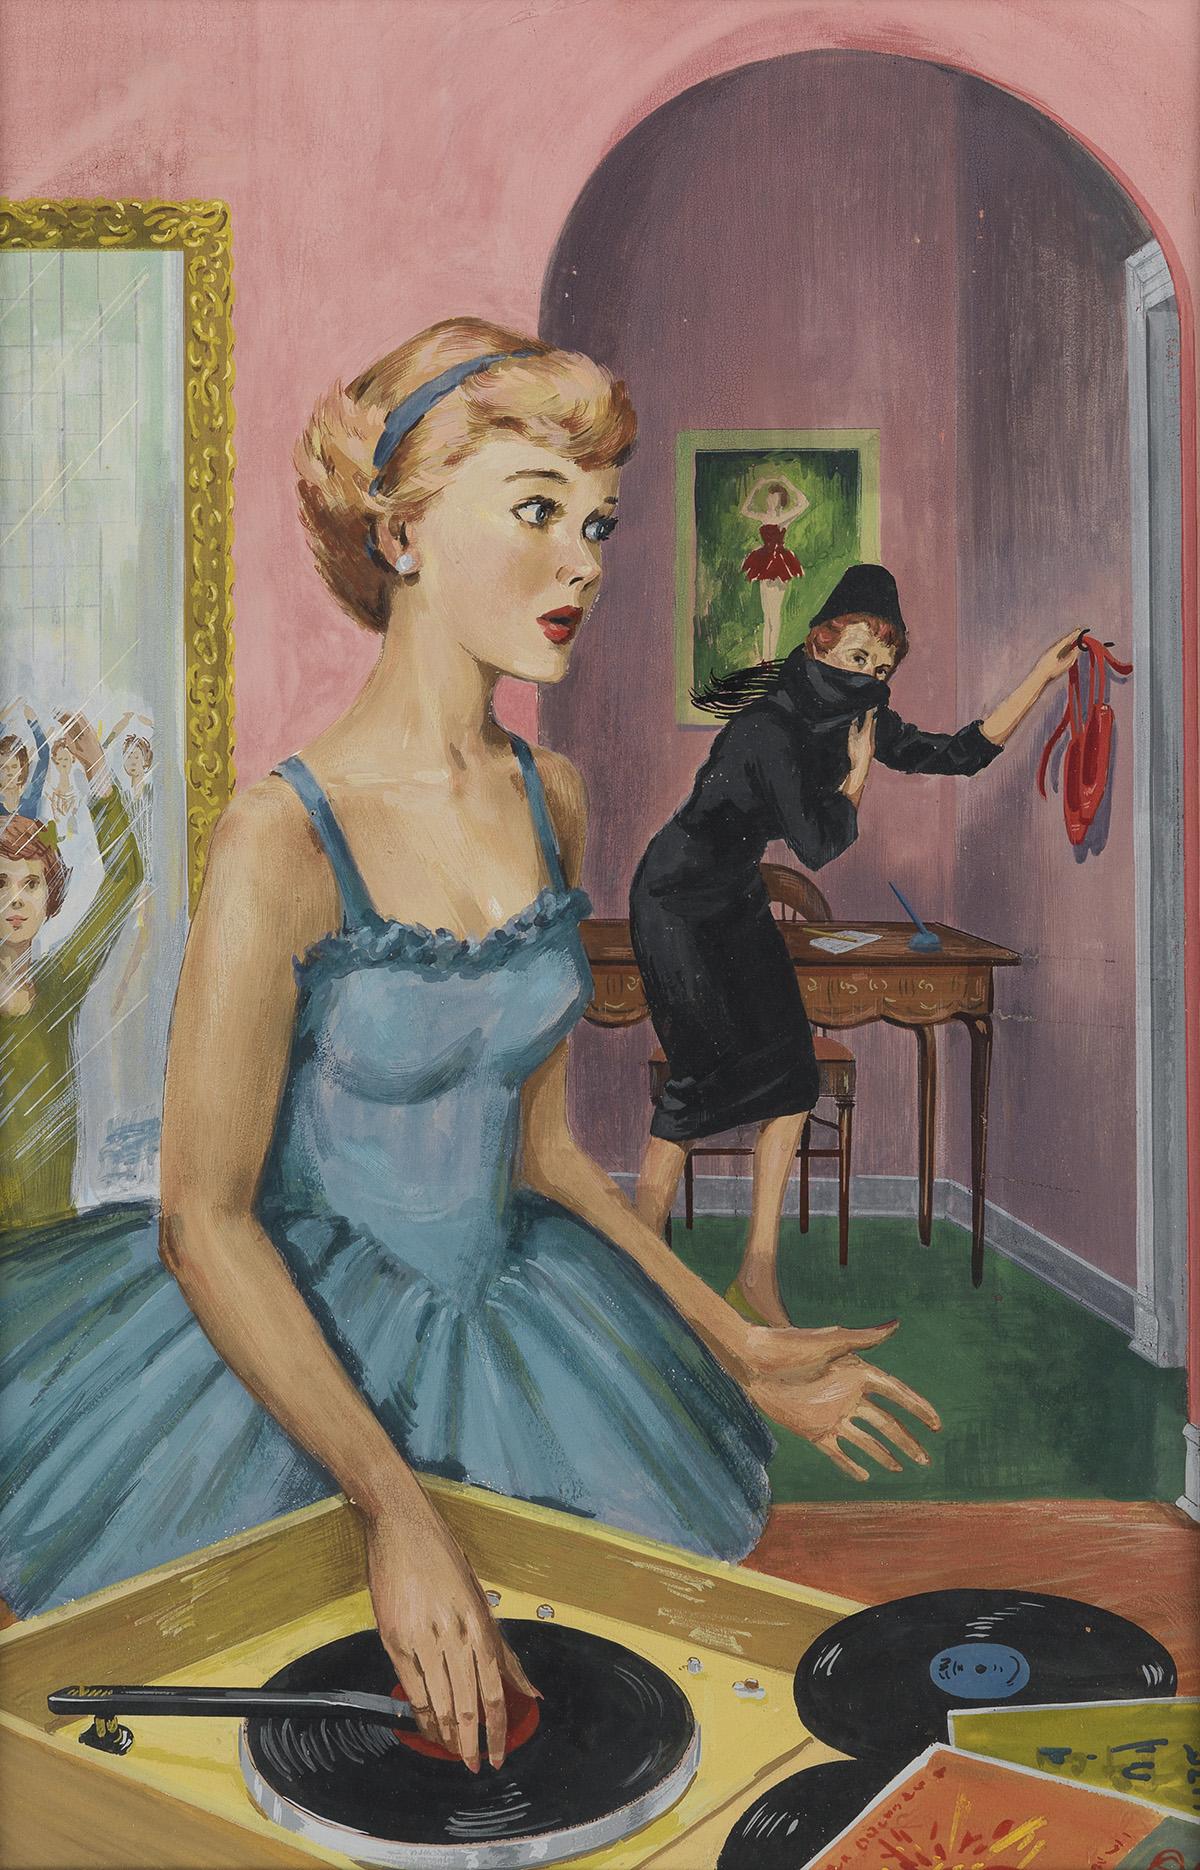 (NANCY DREW / MYSTERY) POLLY BOLIAN. The Scarlet Slipper Mystery.